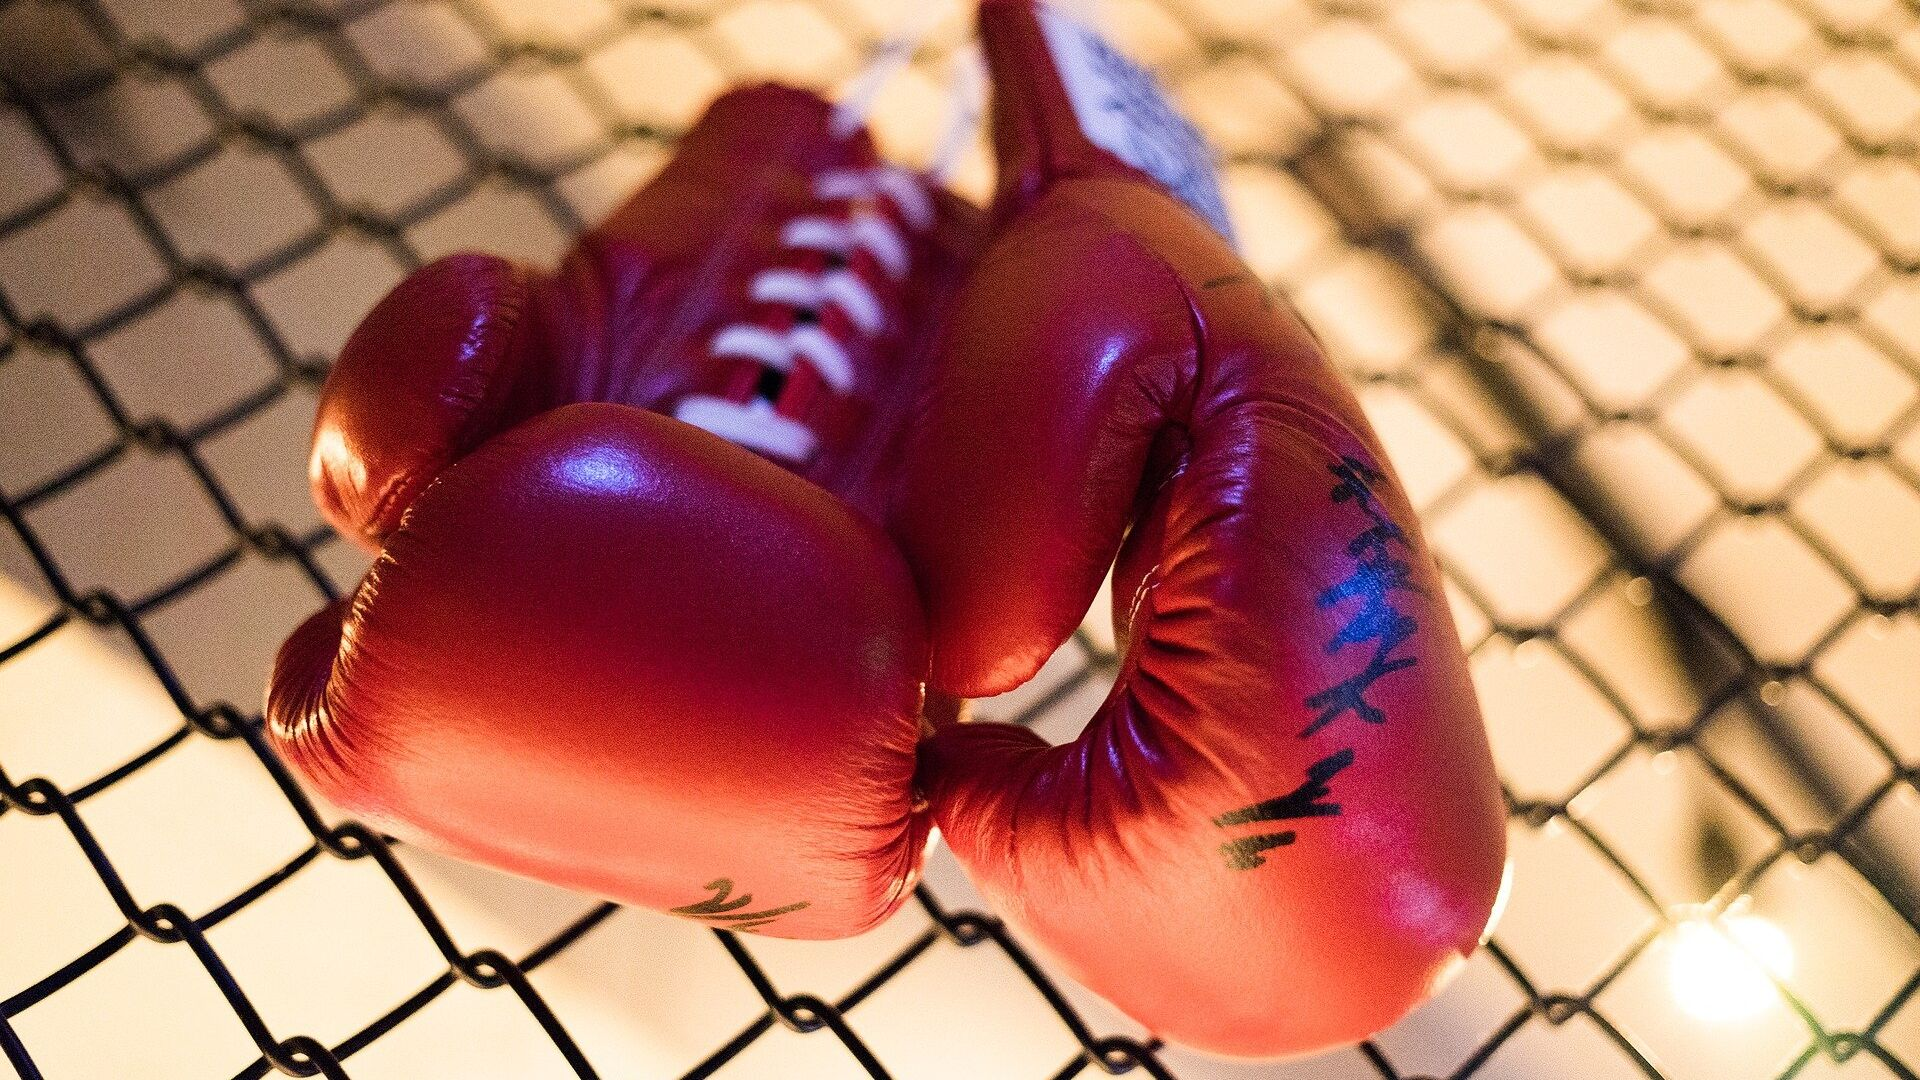 Guantes de boxeo - Sputnik Mundo, 1920, 26.07.2021